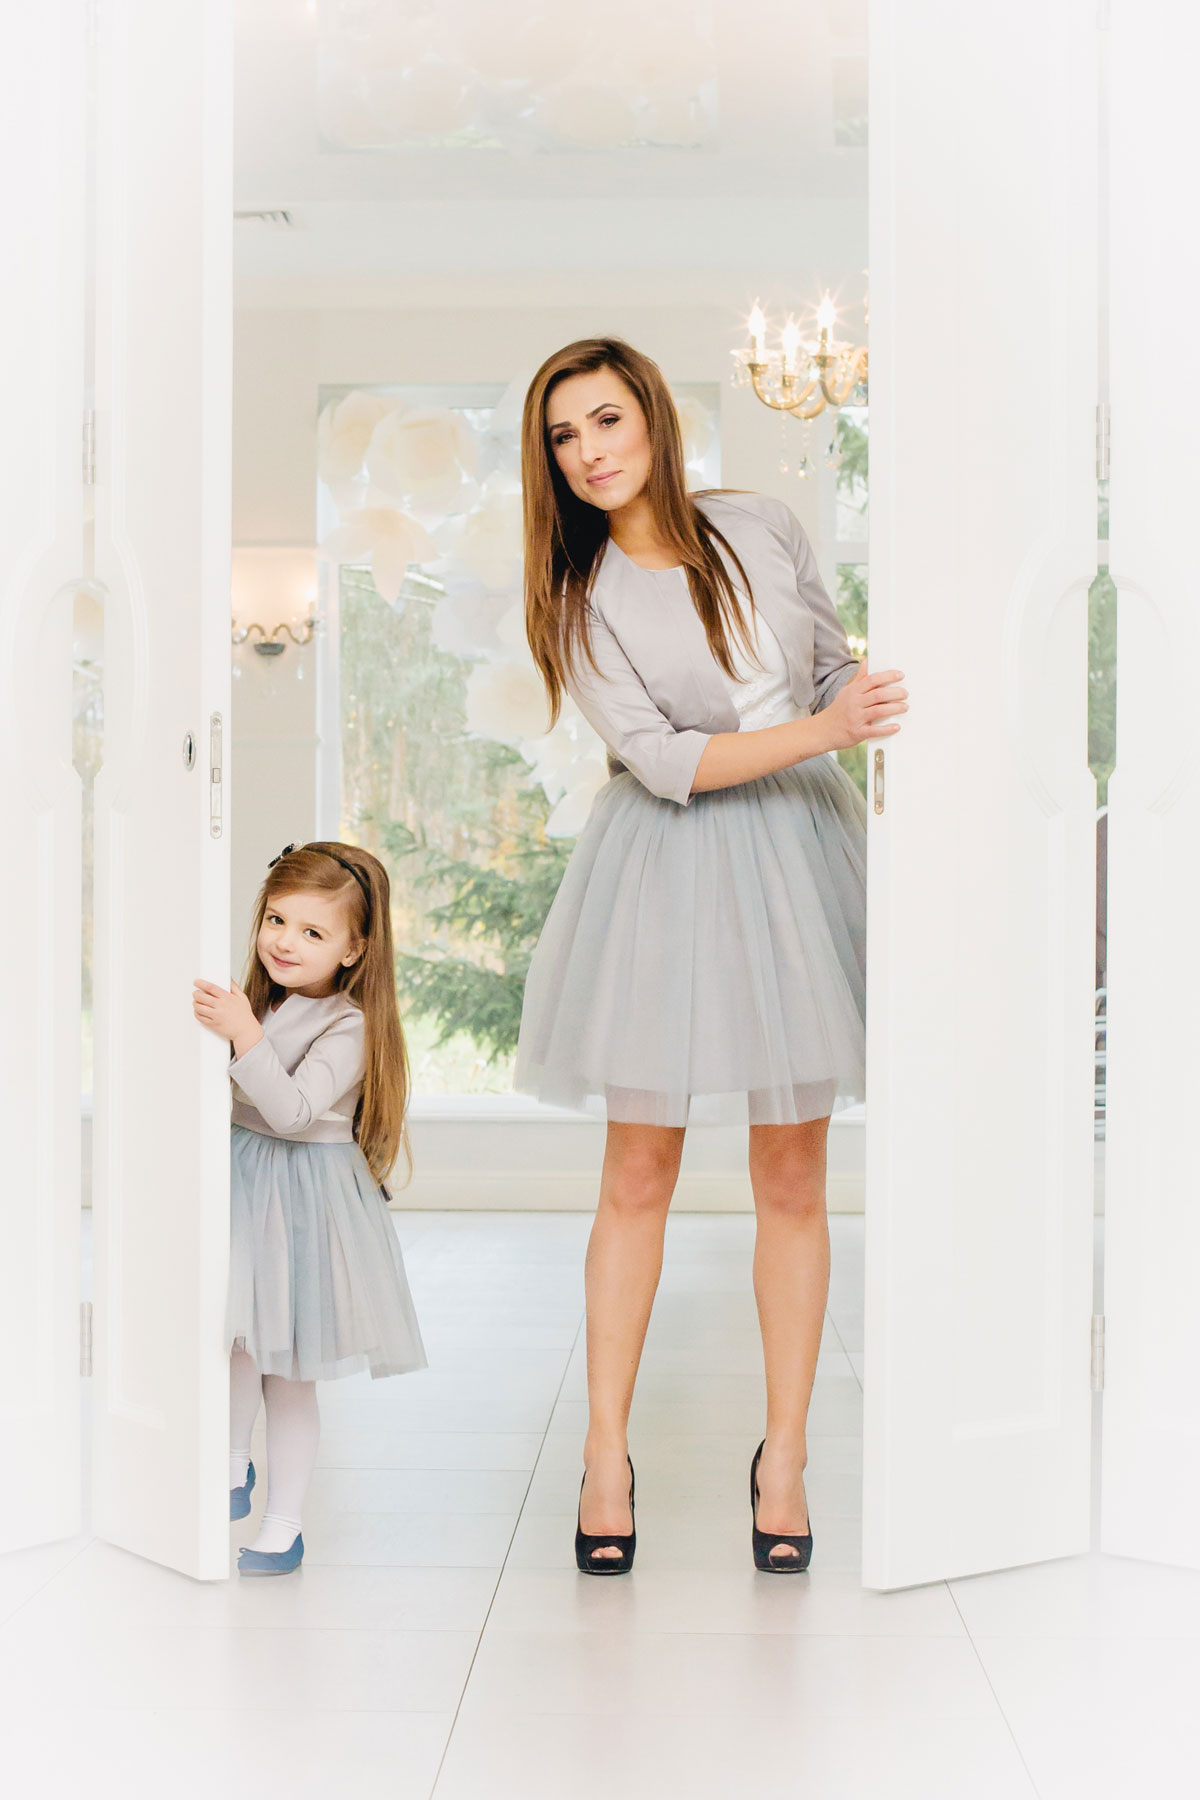 Mutter Tochter Kleider - Entdecke den zuckersüßen Trend